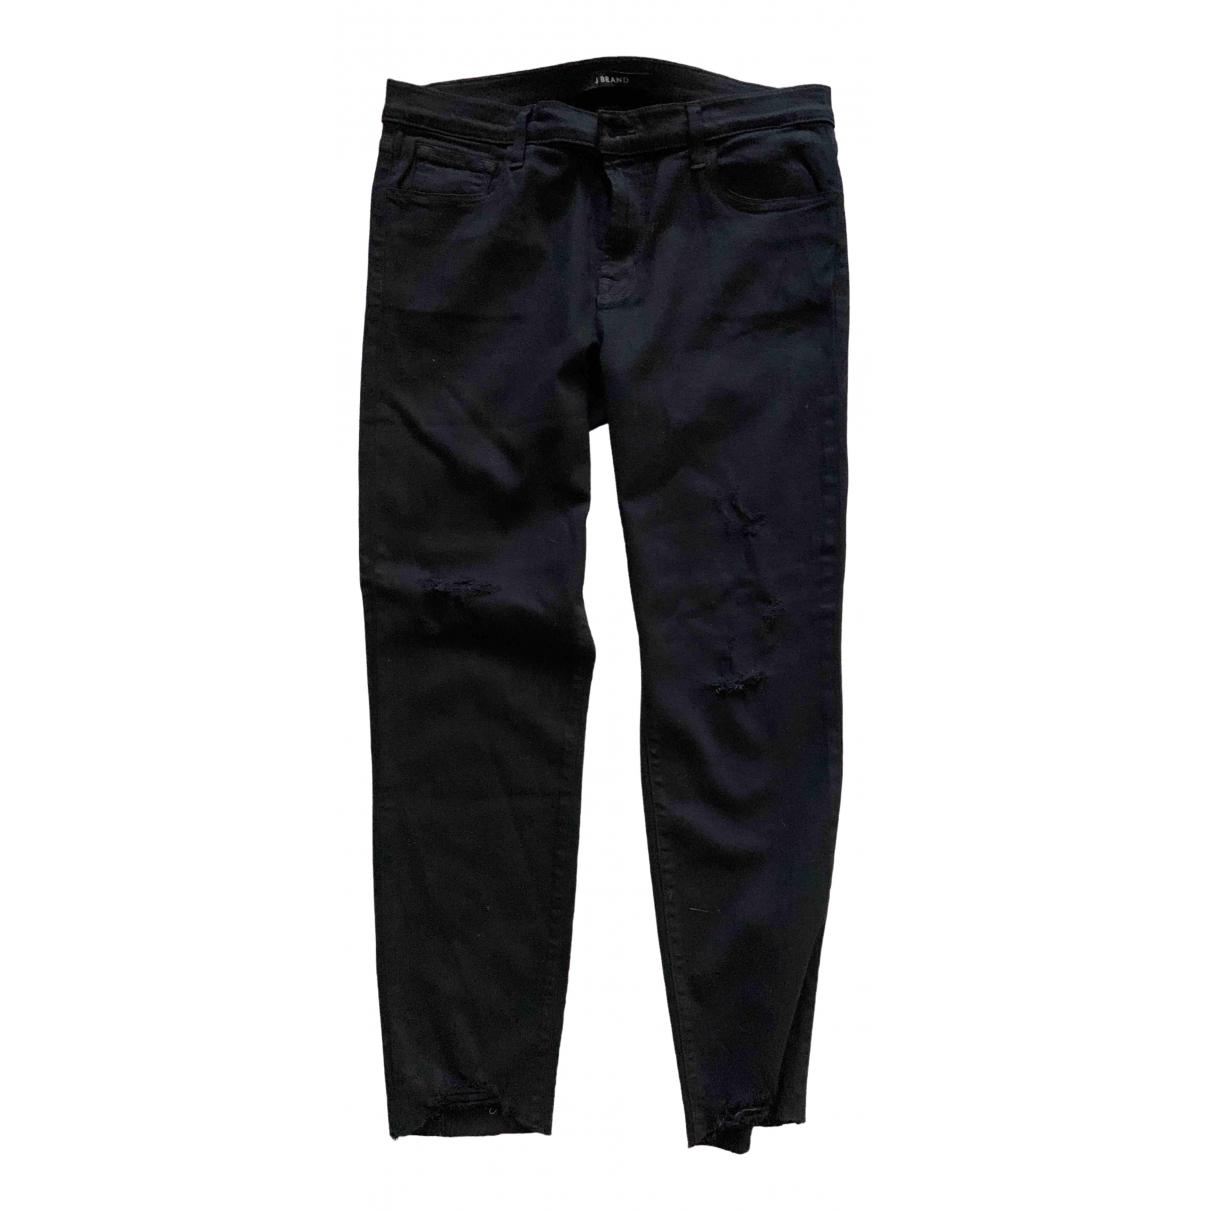 J Brand \N Black Cotton - elasthane Jeans for Women 31 US